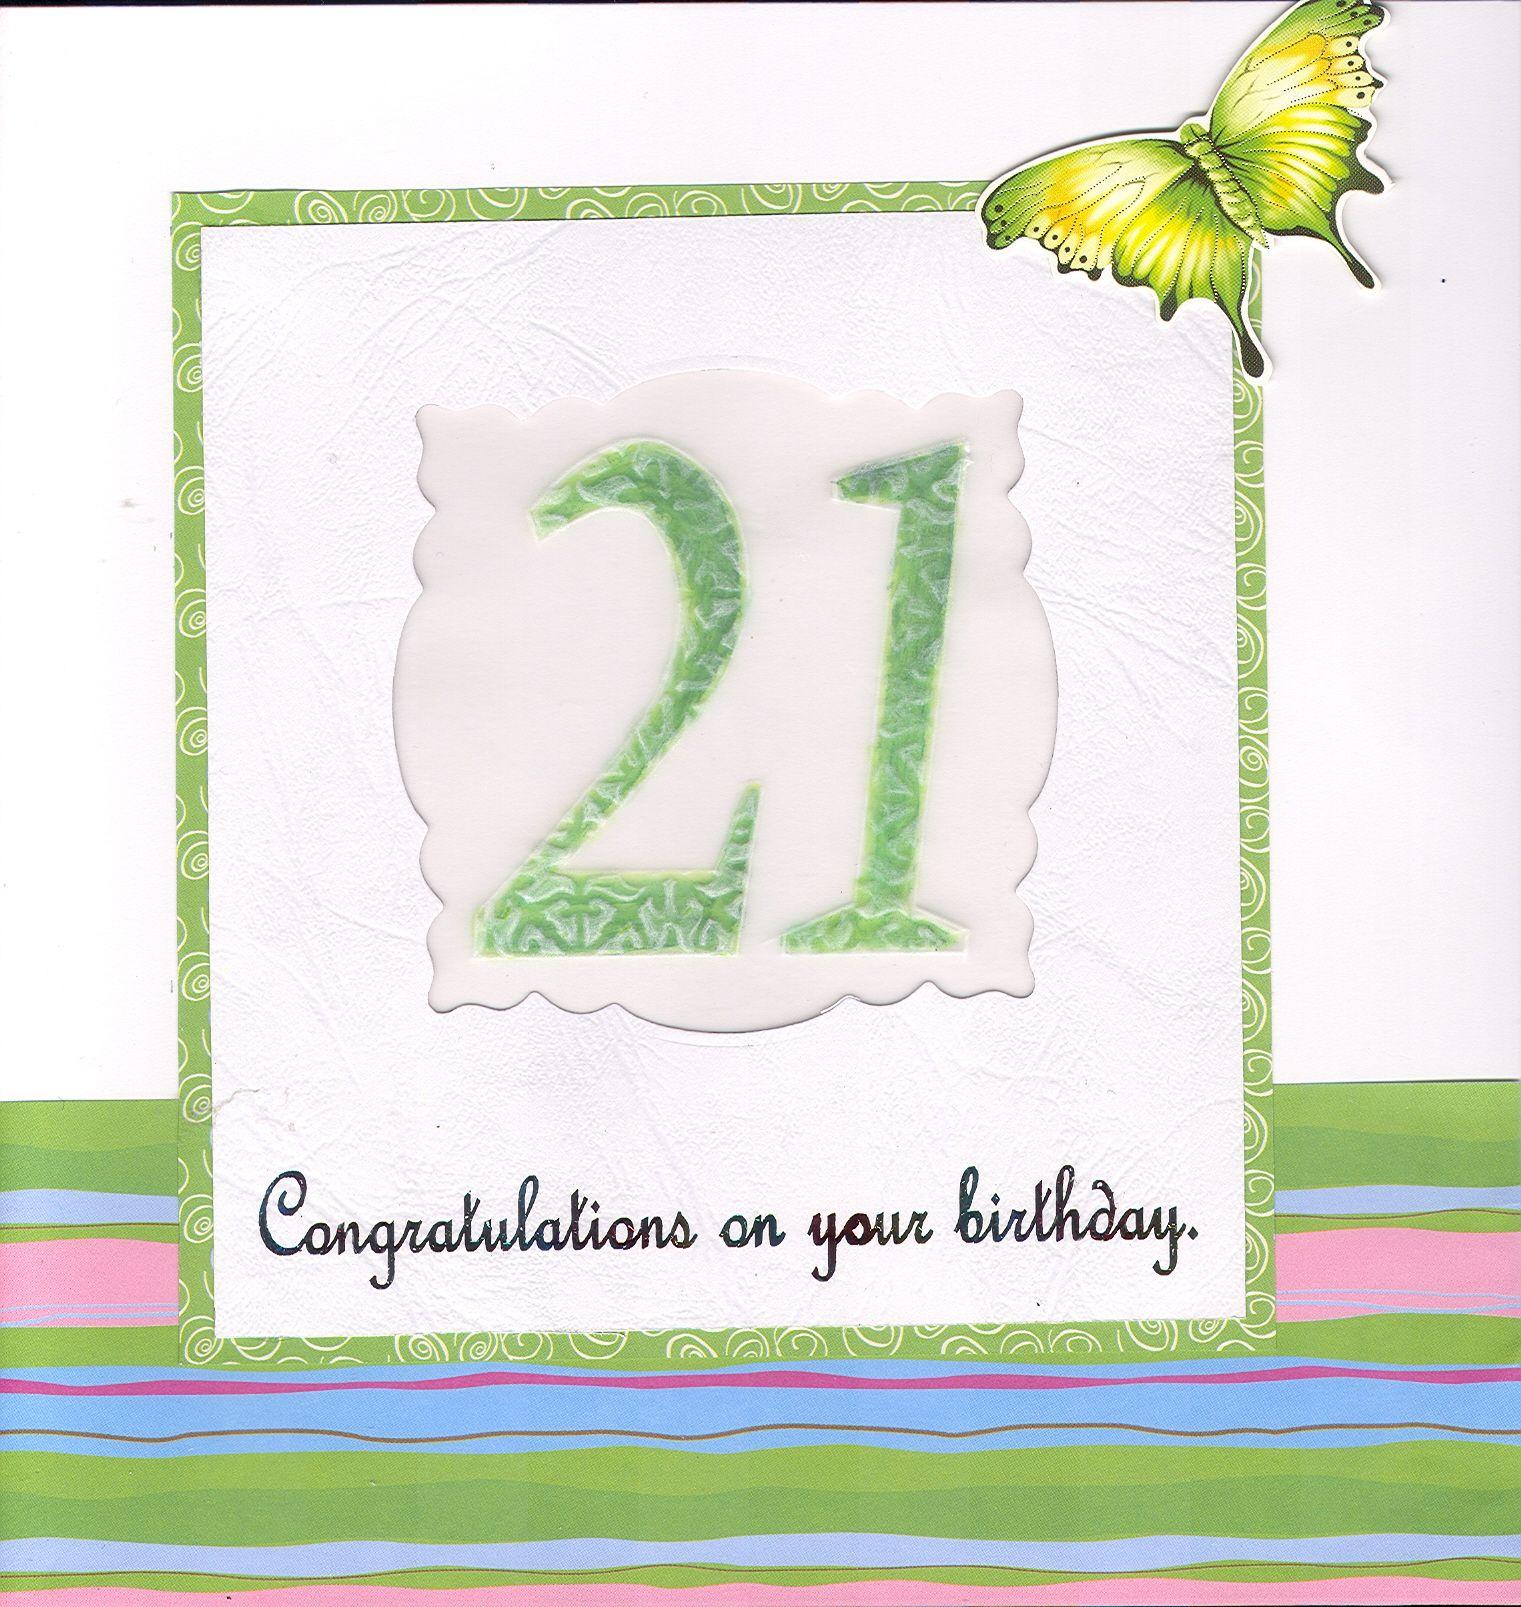 Lyn's work.  21st Birthday card.  Vellum, hot foil text, die cut window.